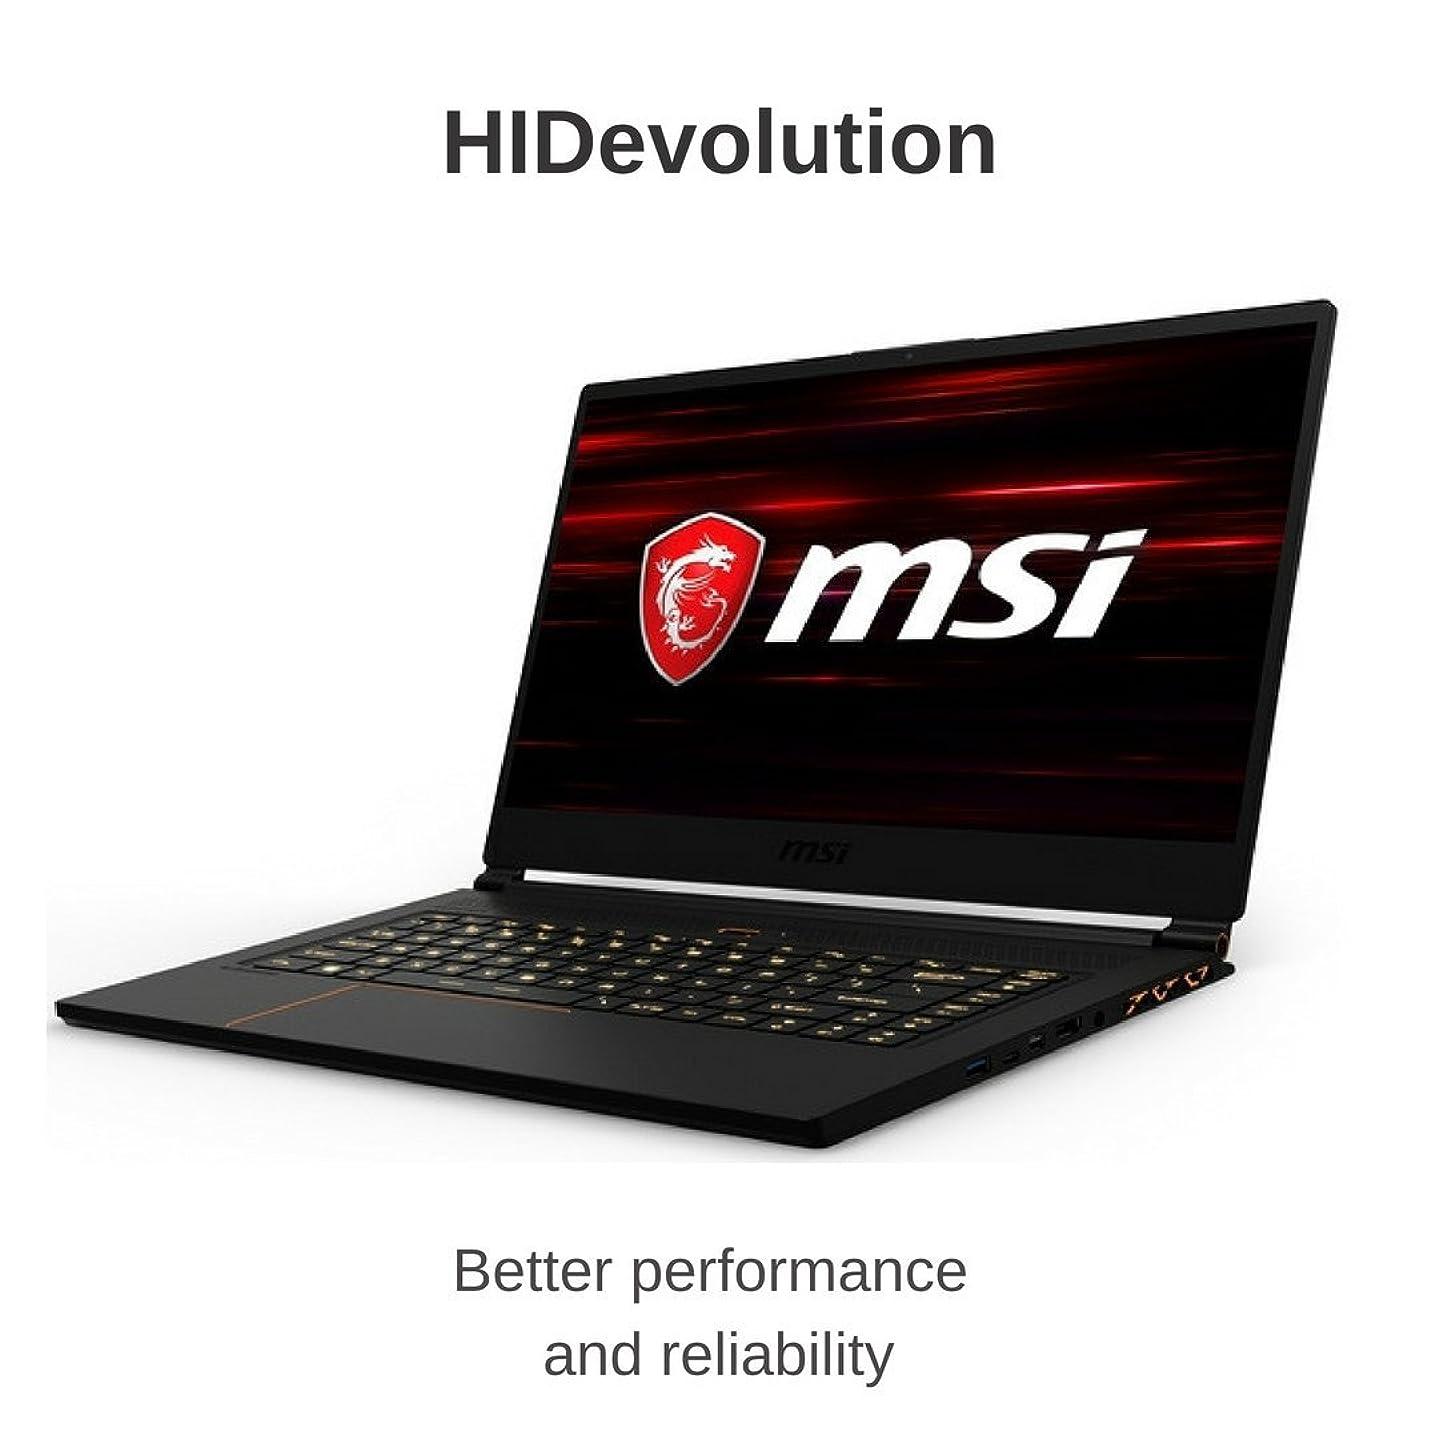 "Gaming Laptop, HIDevolution MSI GS65 8RF 15.6"" FHD 144Hz, 2.2 GHz i7-8750H, GTX 1070, 16GB DDR4/2400MHz RAM, PCIe 512GB SSD, Authorized Performance Upgrades & Warranty"